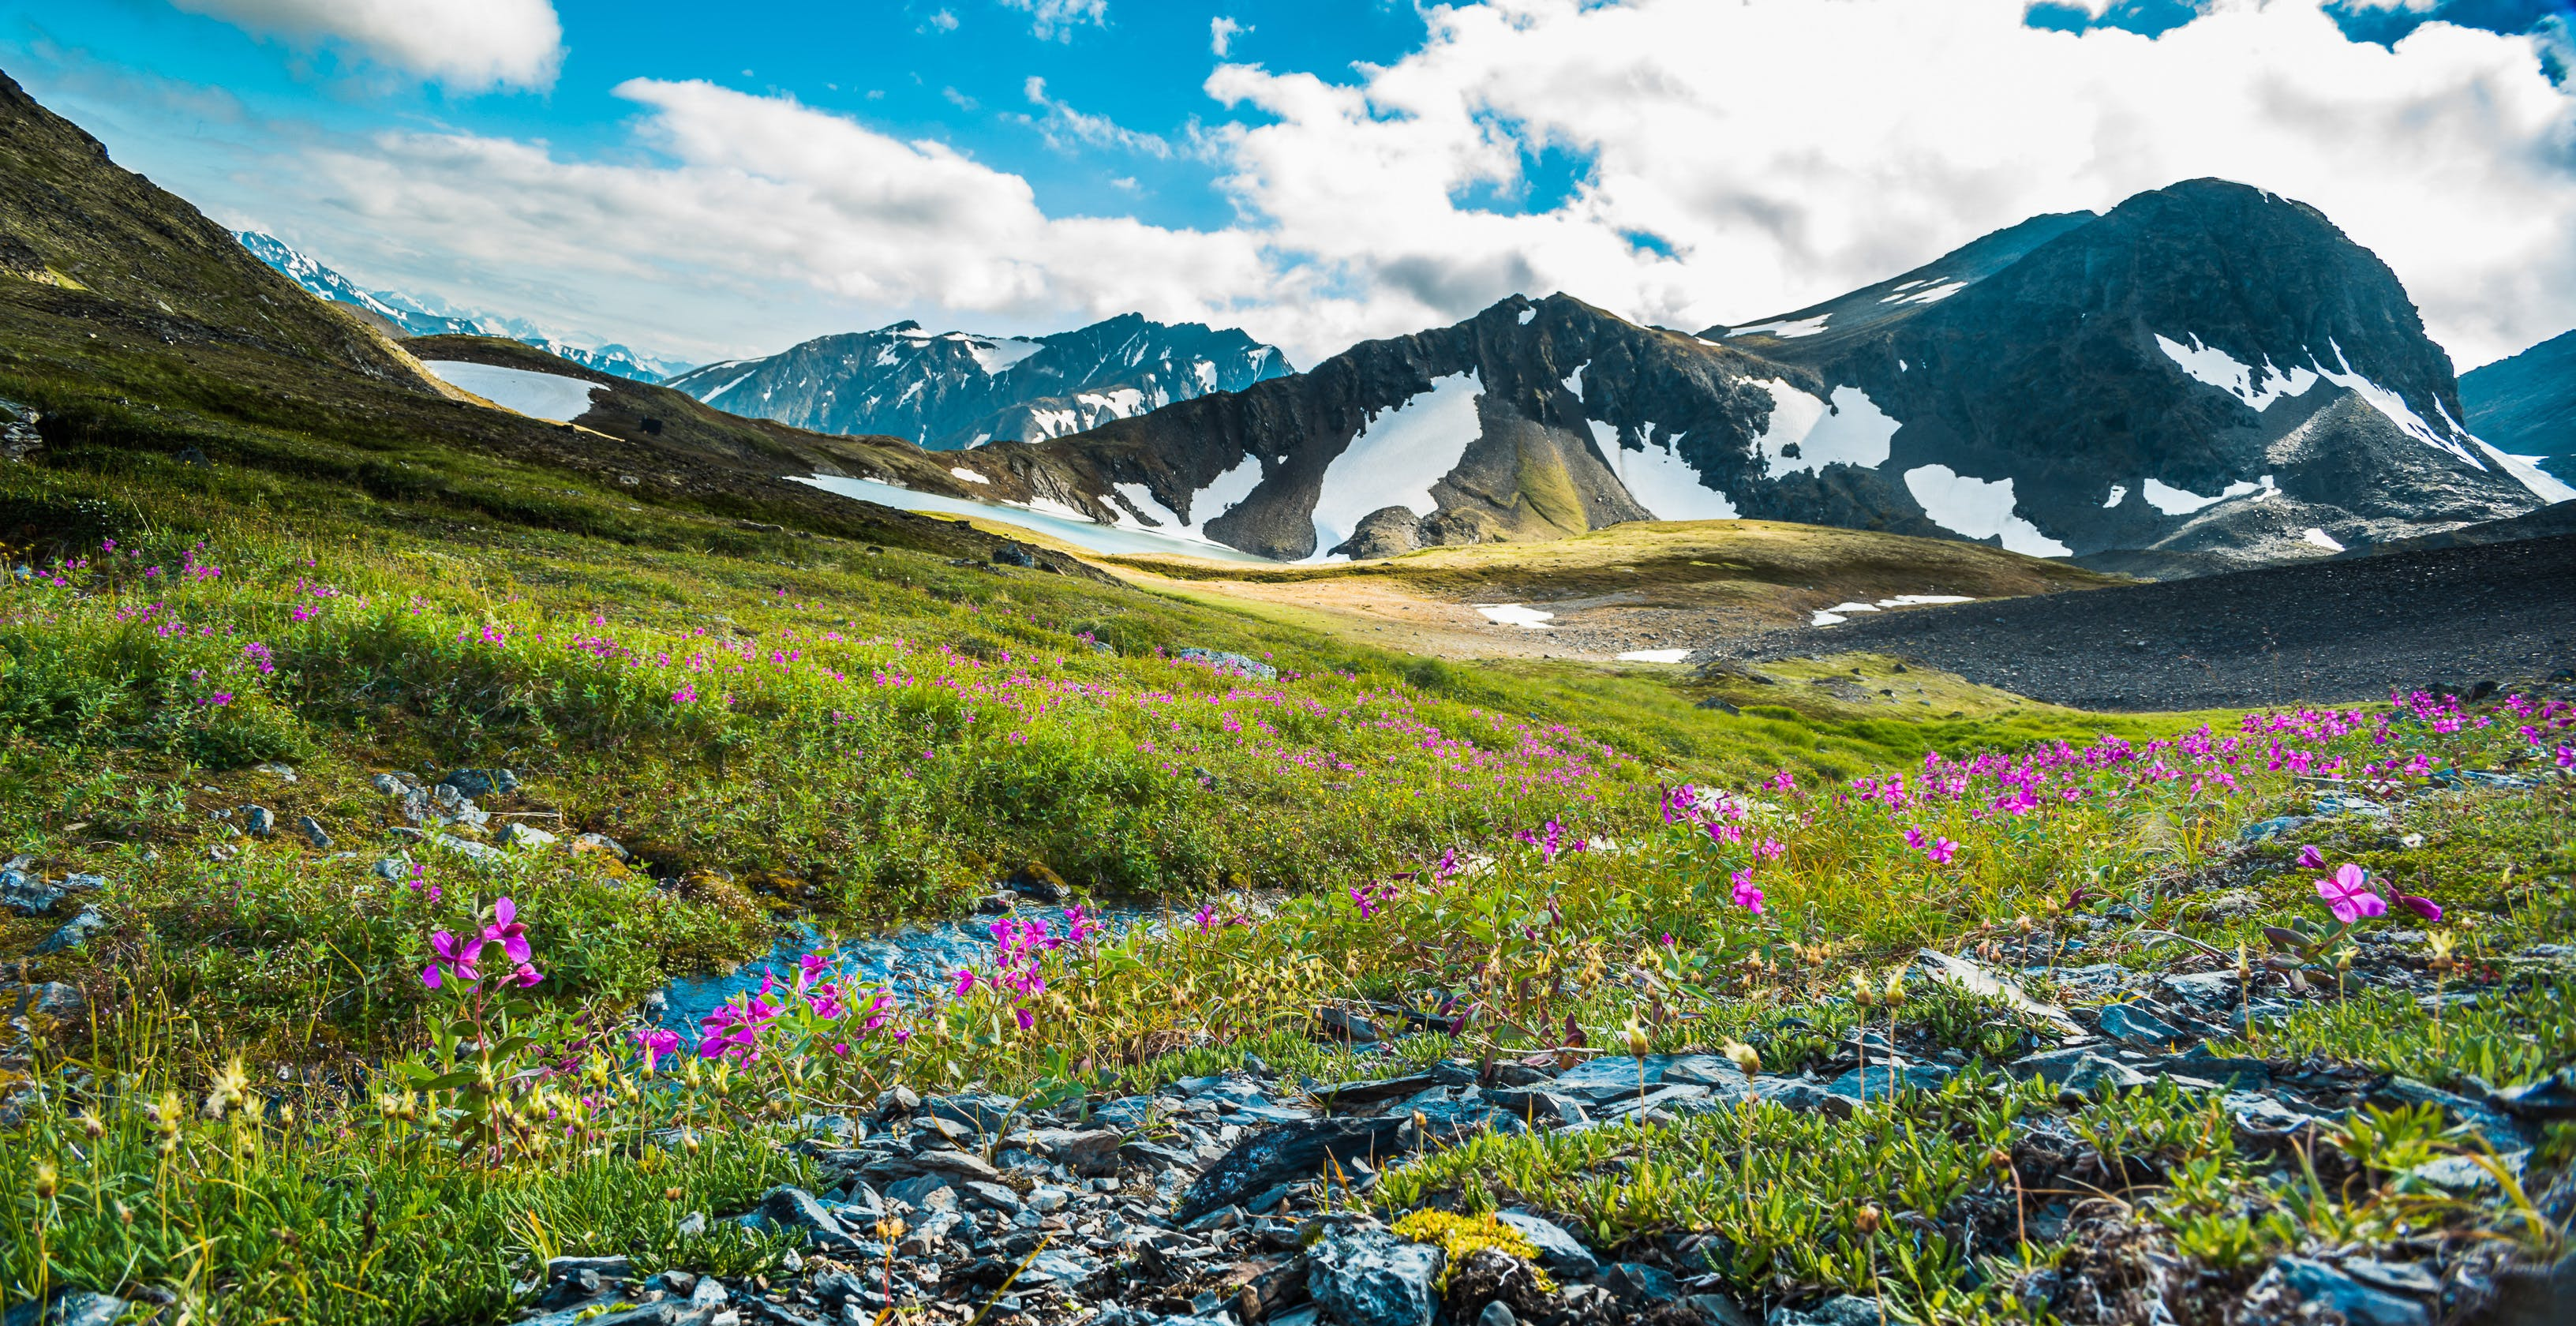 Alaska in full bloom.